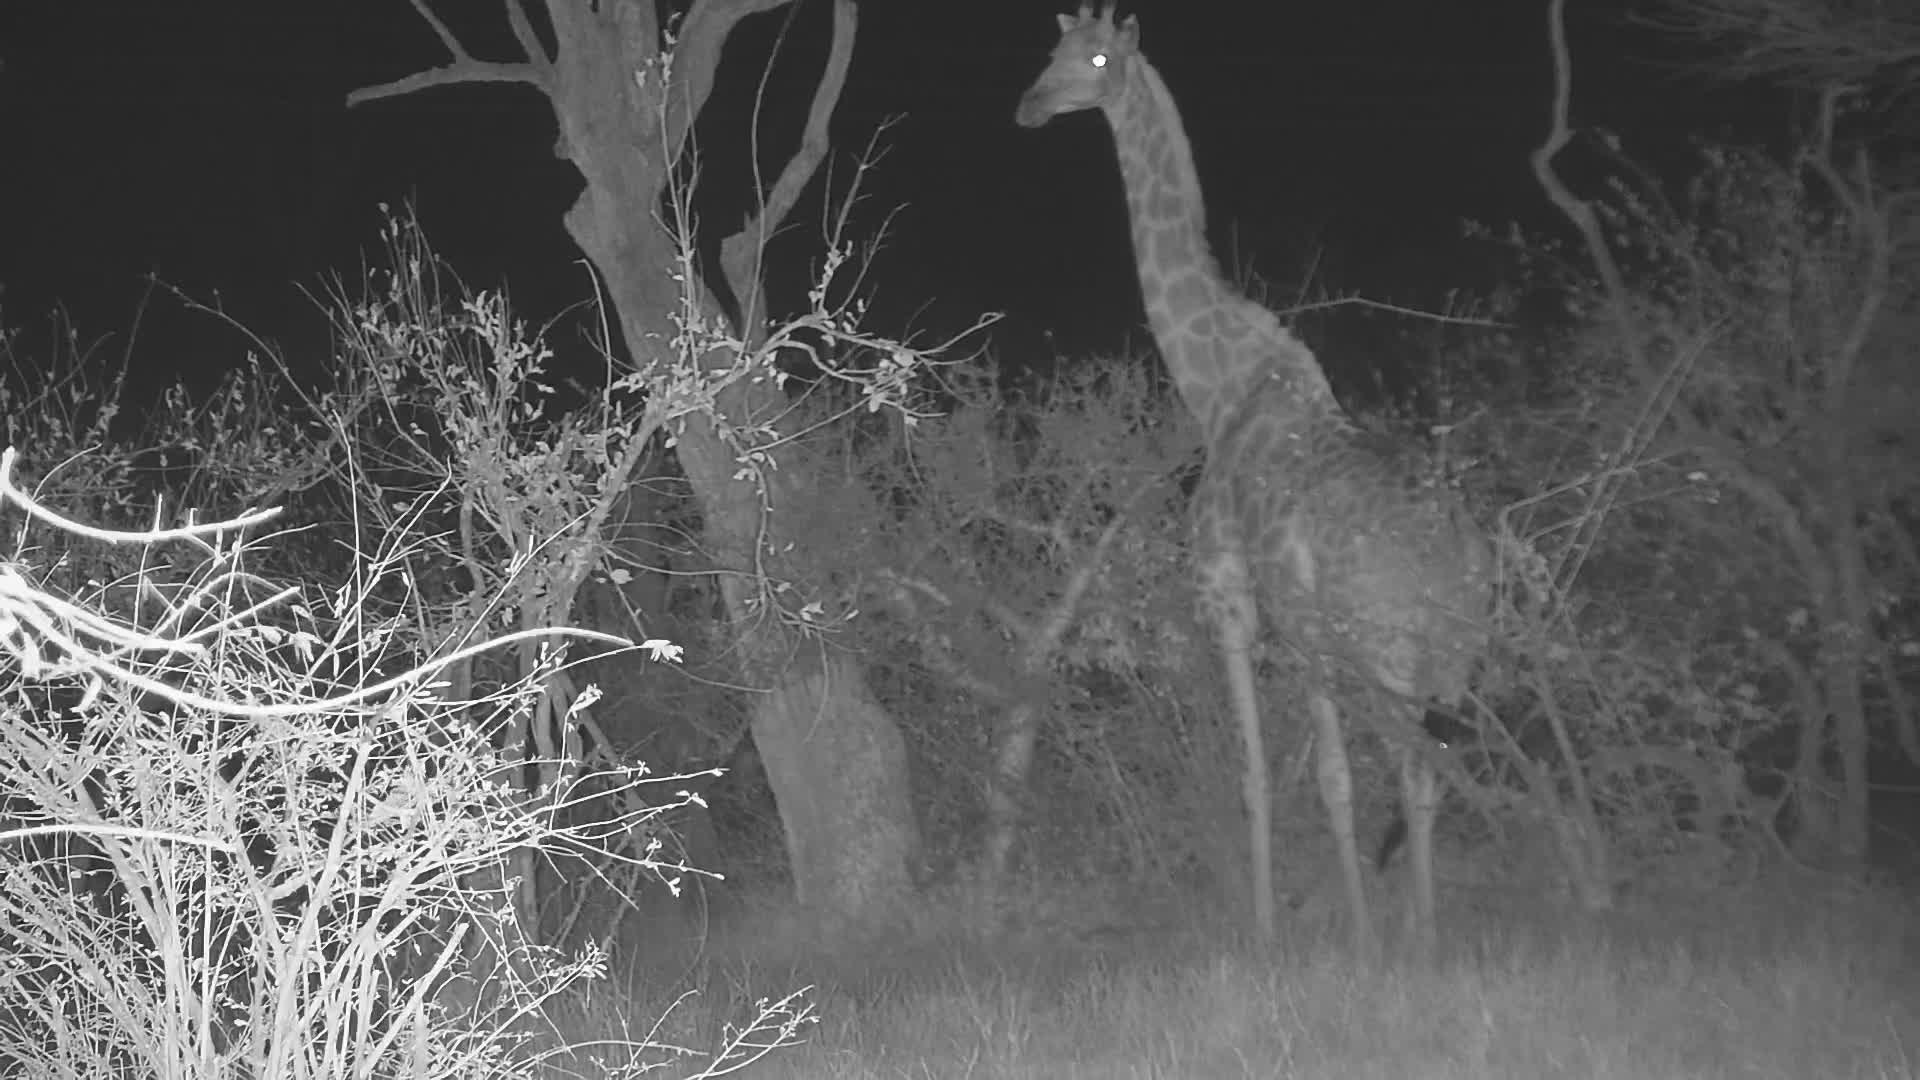 VIDEO: Giraffe and friend